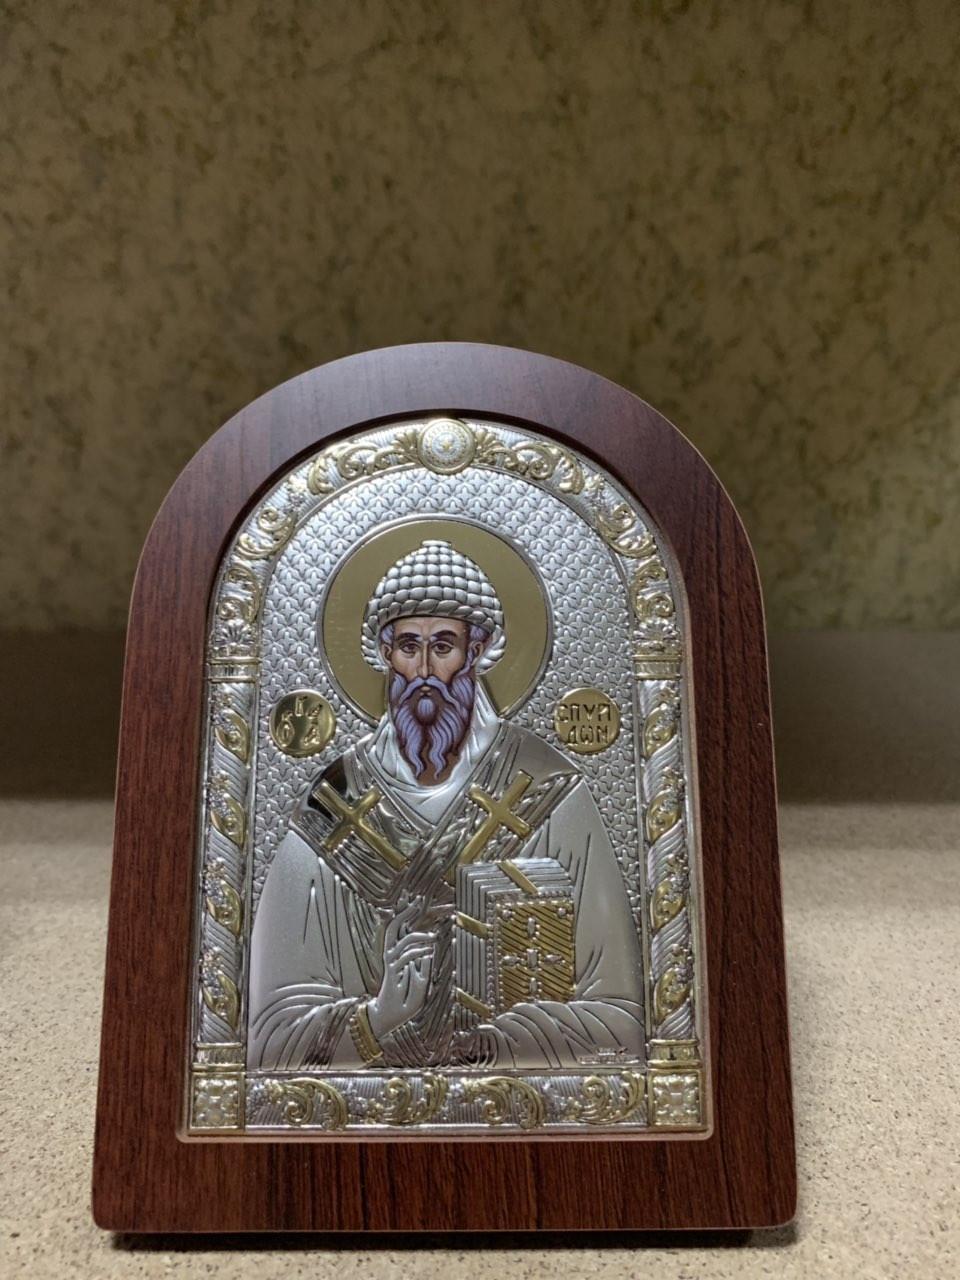 Икона Святой Спиридон AGIO SILVER (Греция) Серебряная с позолотой 75 х 103 мм